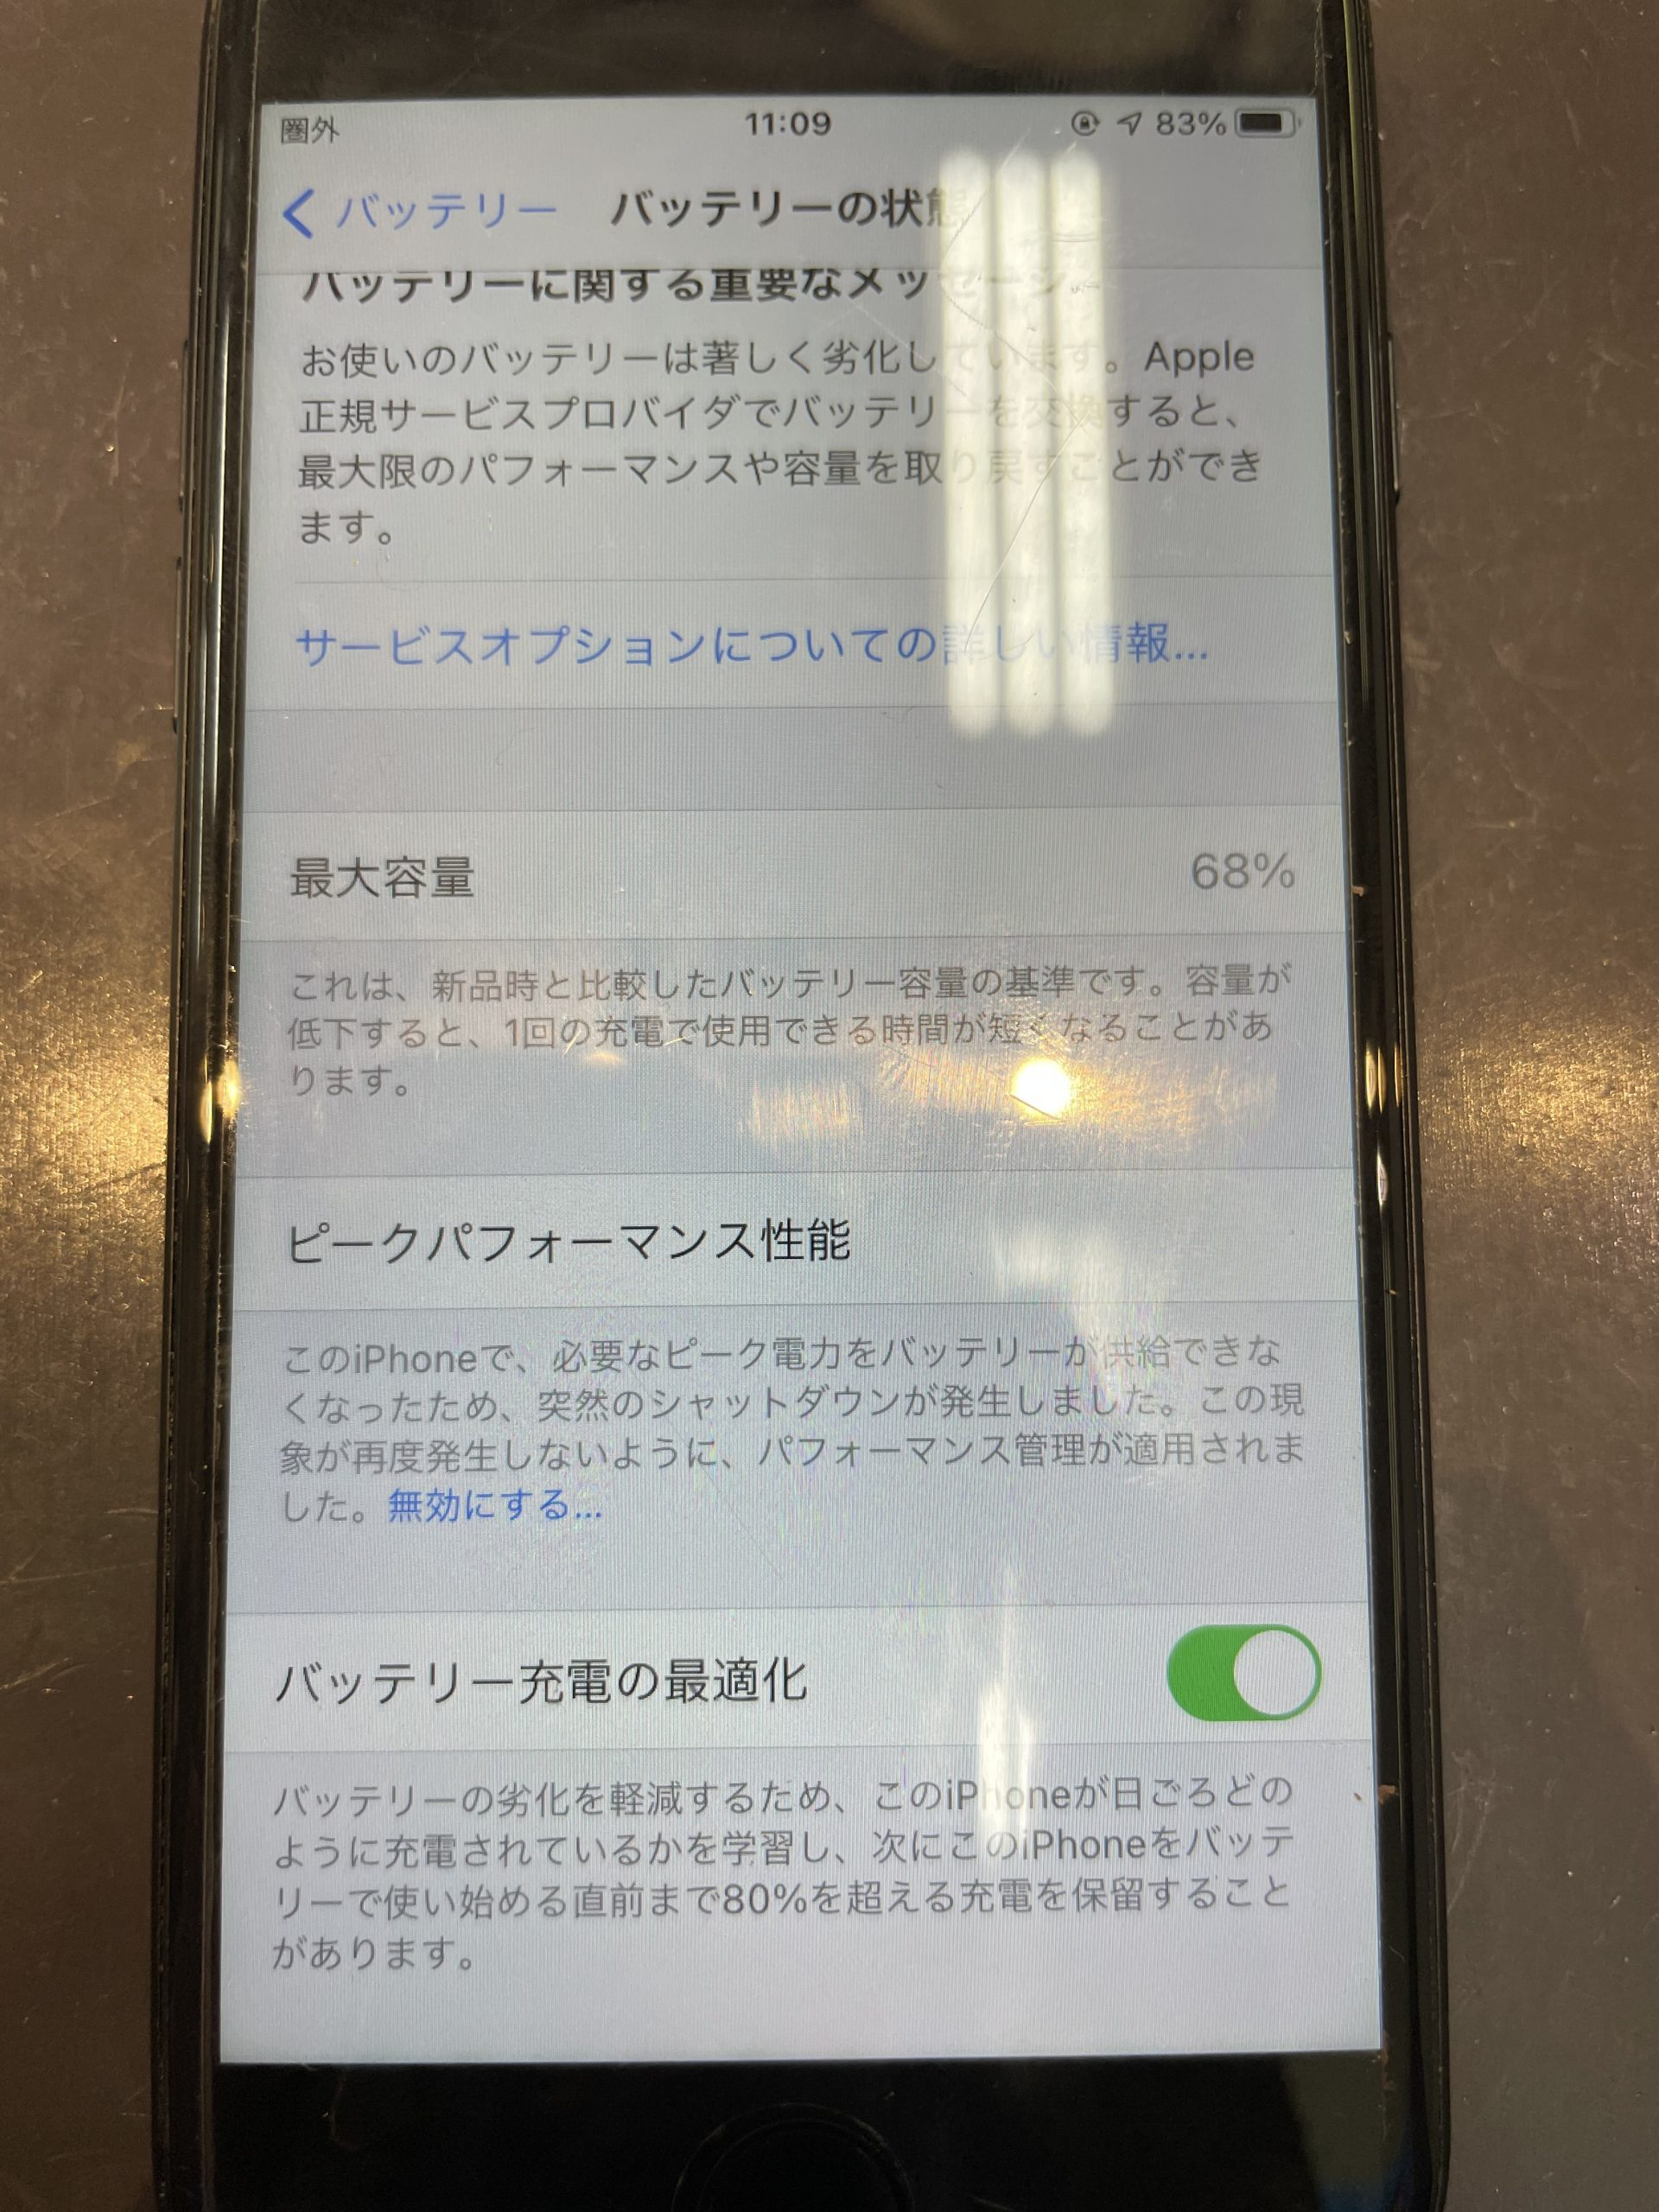 【iPhone7】バッテリー交換しました!〈柳川市からご来店〉